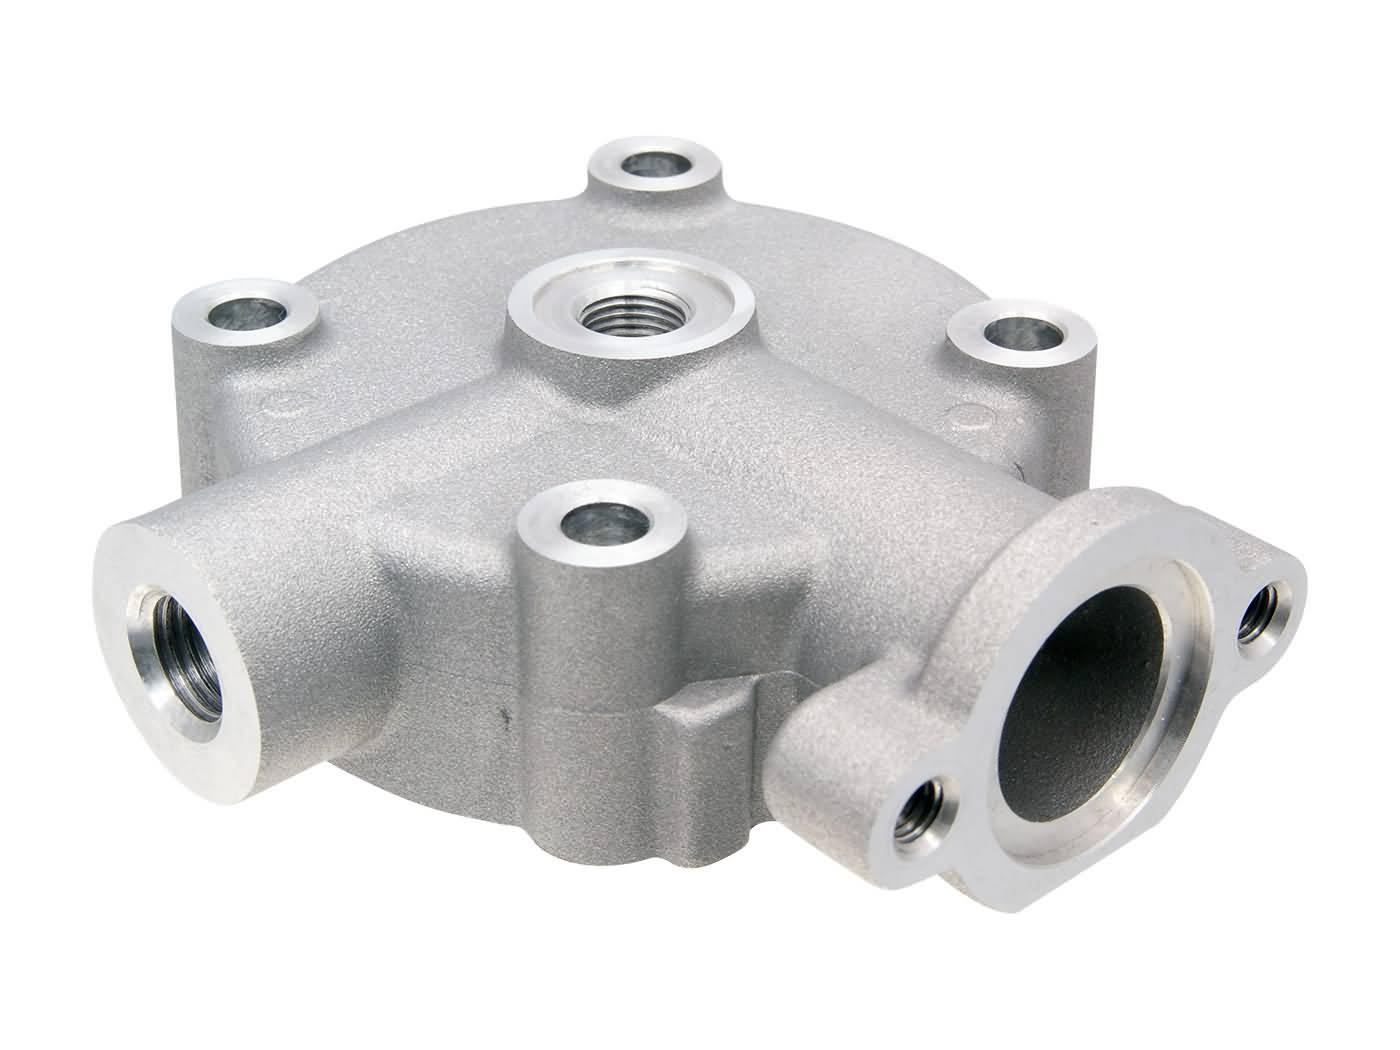 Zylinderkopf Zylinder Kopf Naraku 50 ccm für Pegasus Corona TGB Bullet RS la